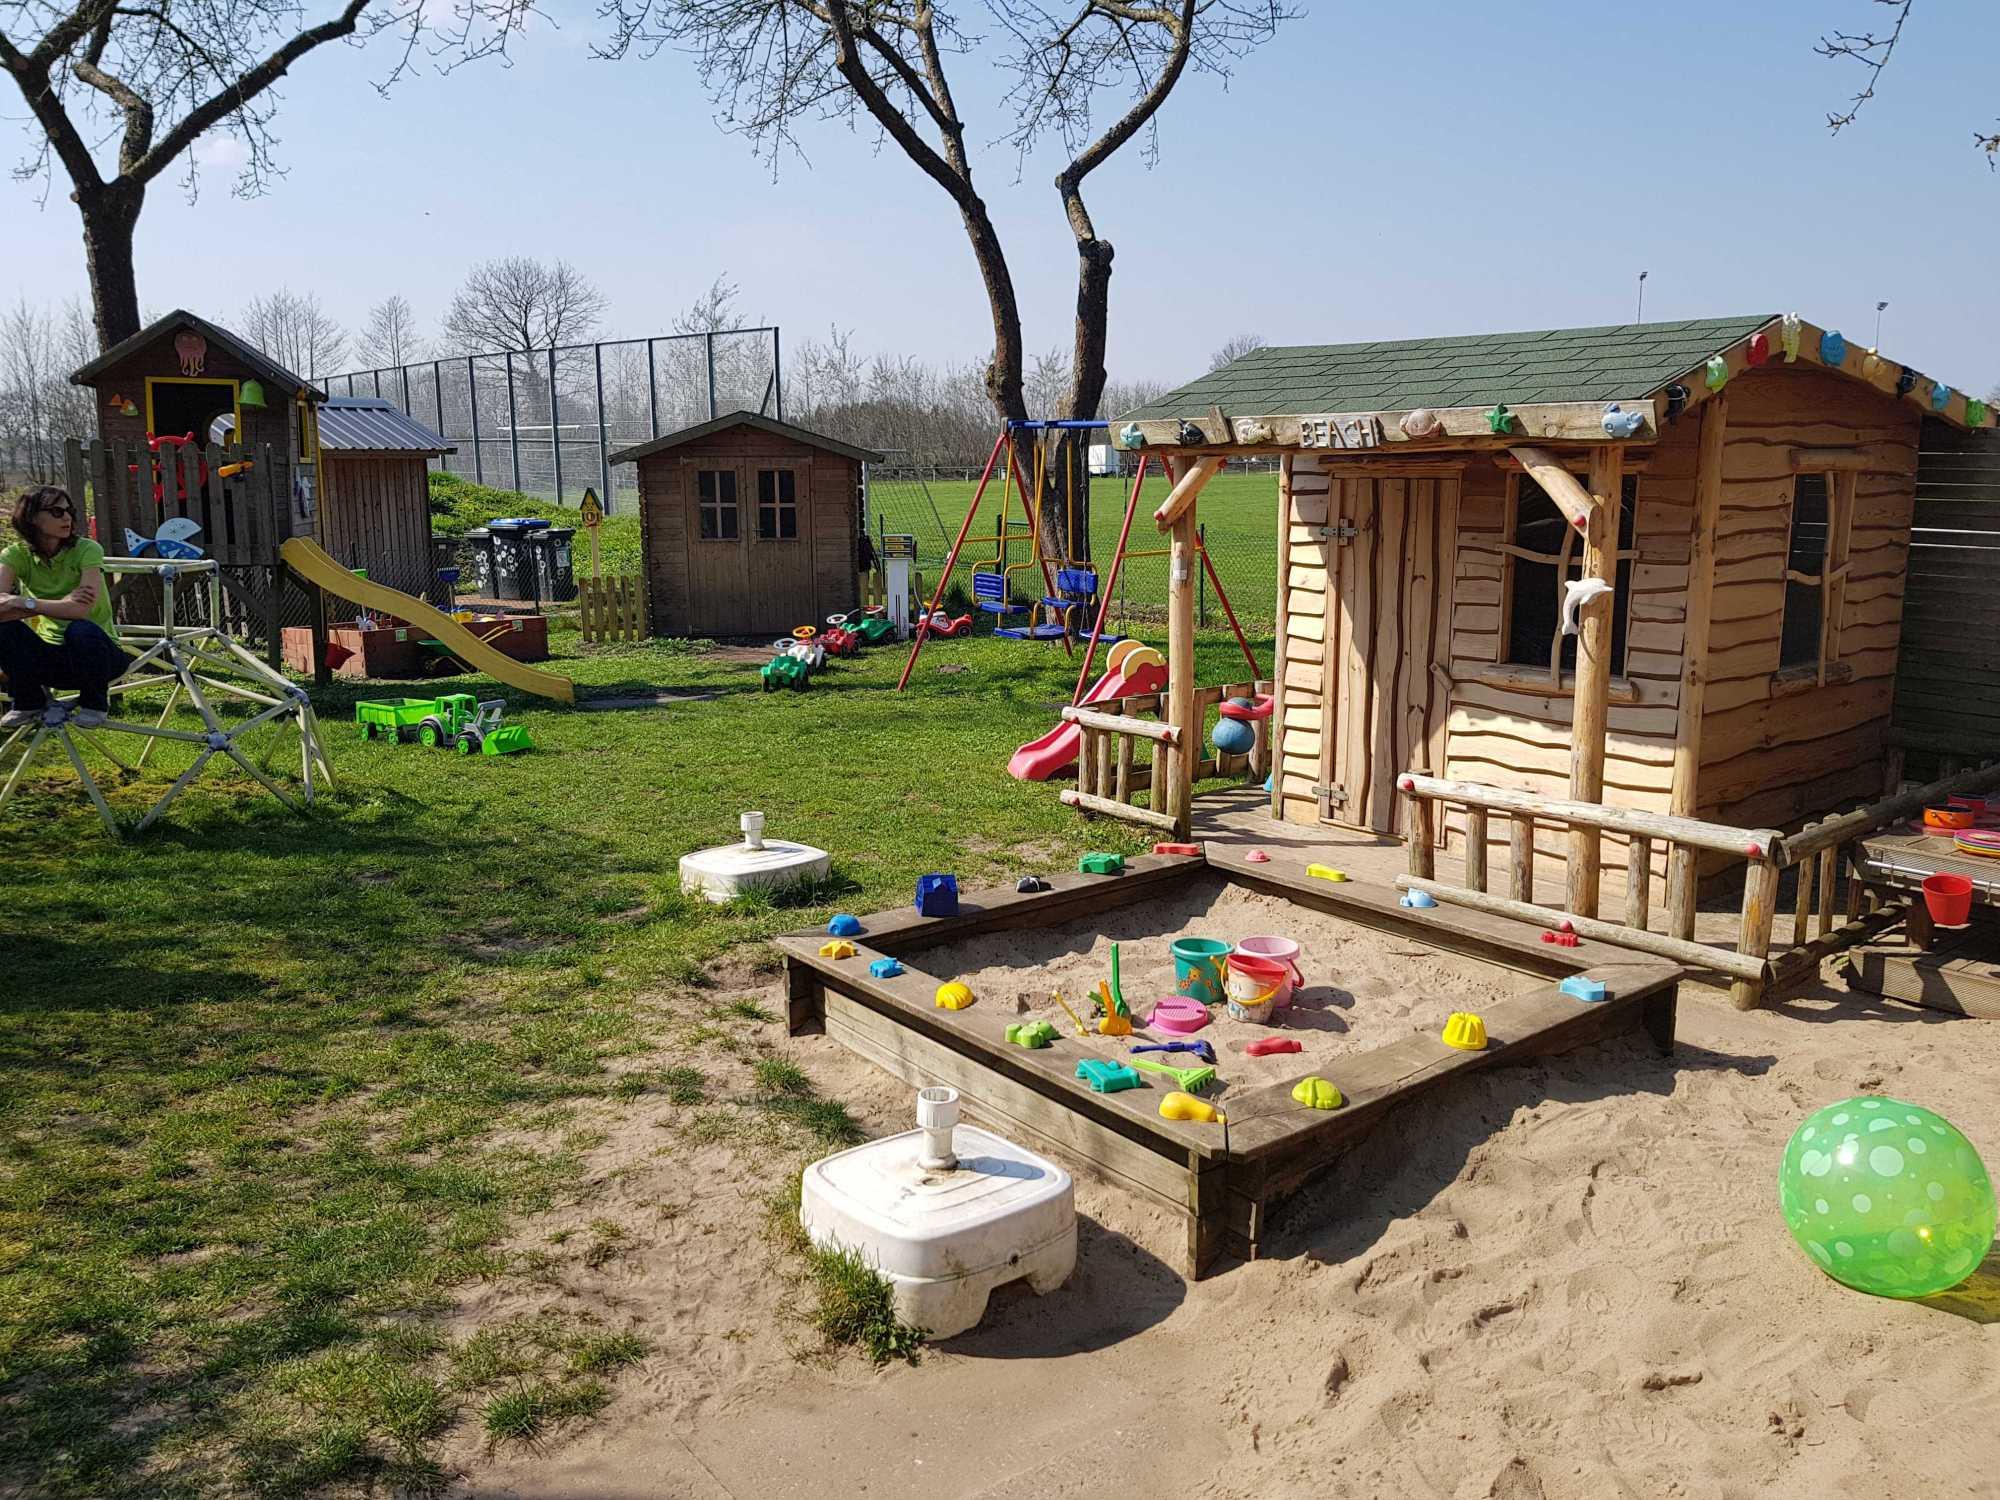 Kita Kid Zone Kinderbetreuung Garten1 15 - Kinder-Beachclub